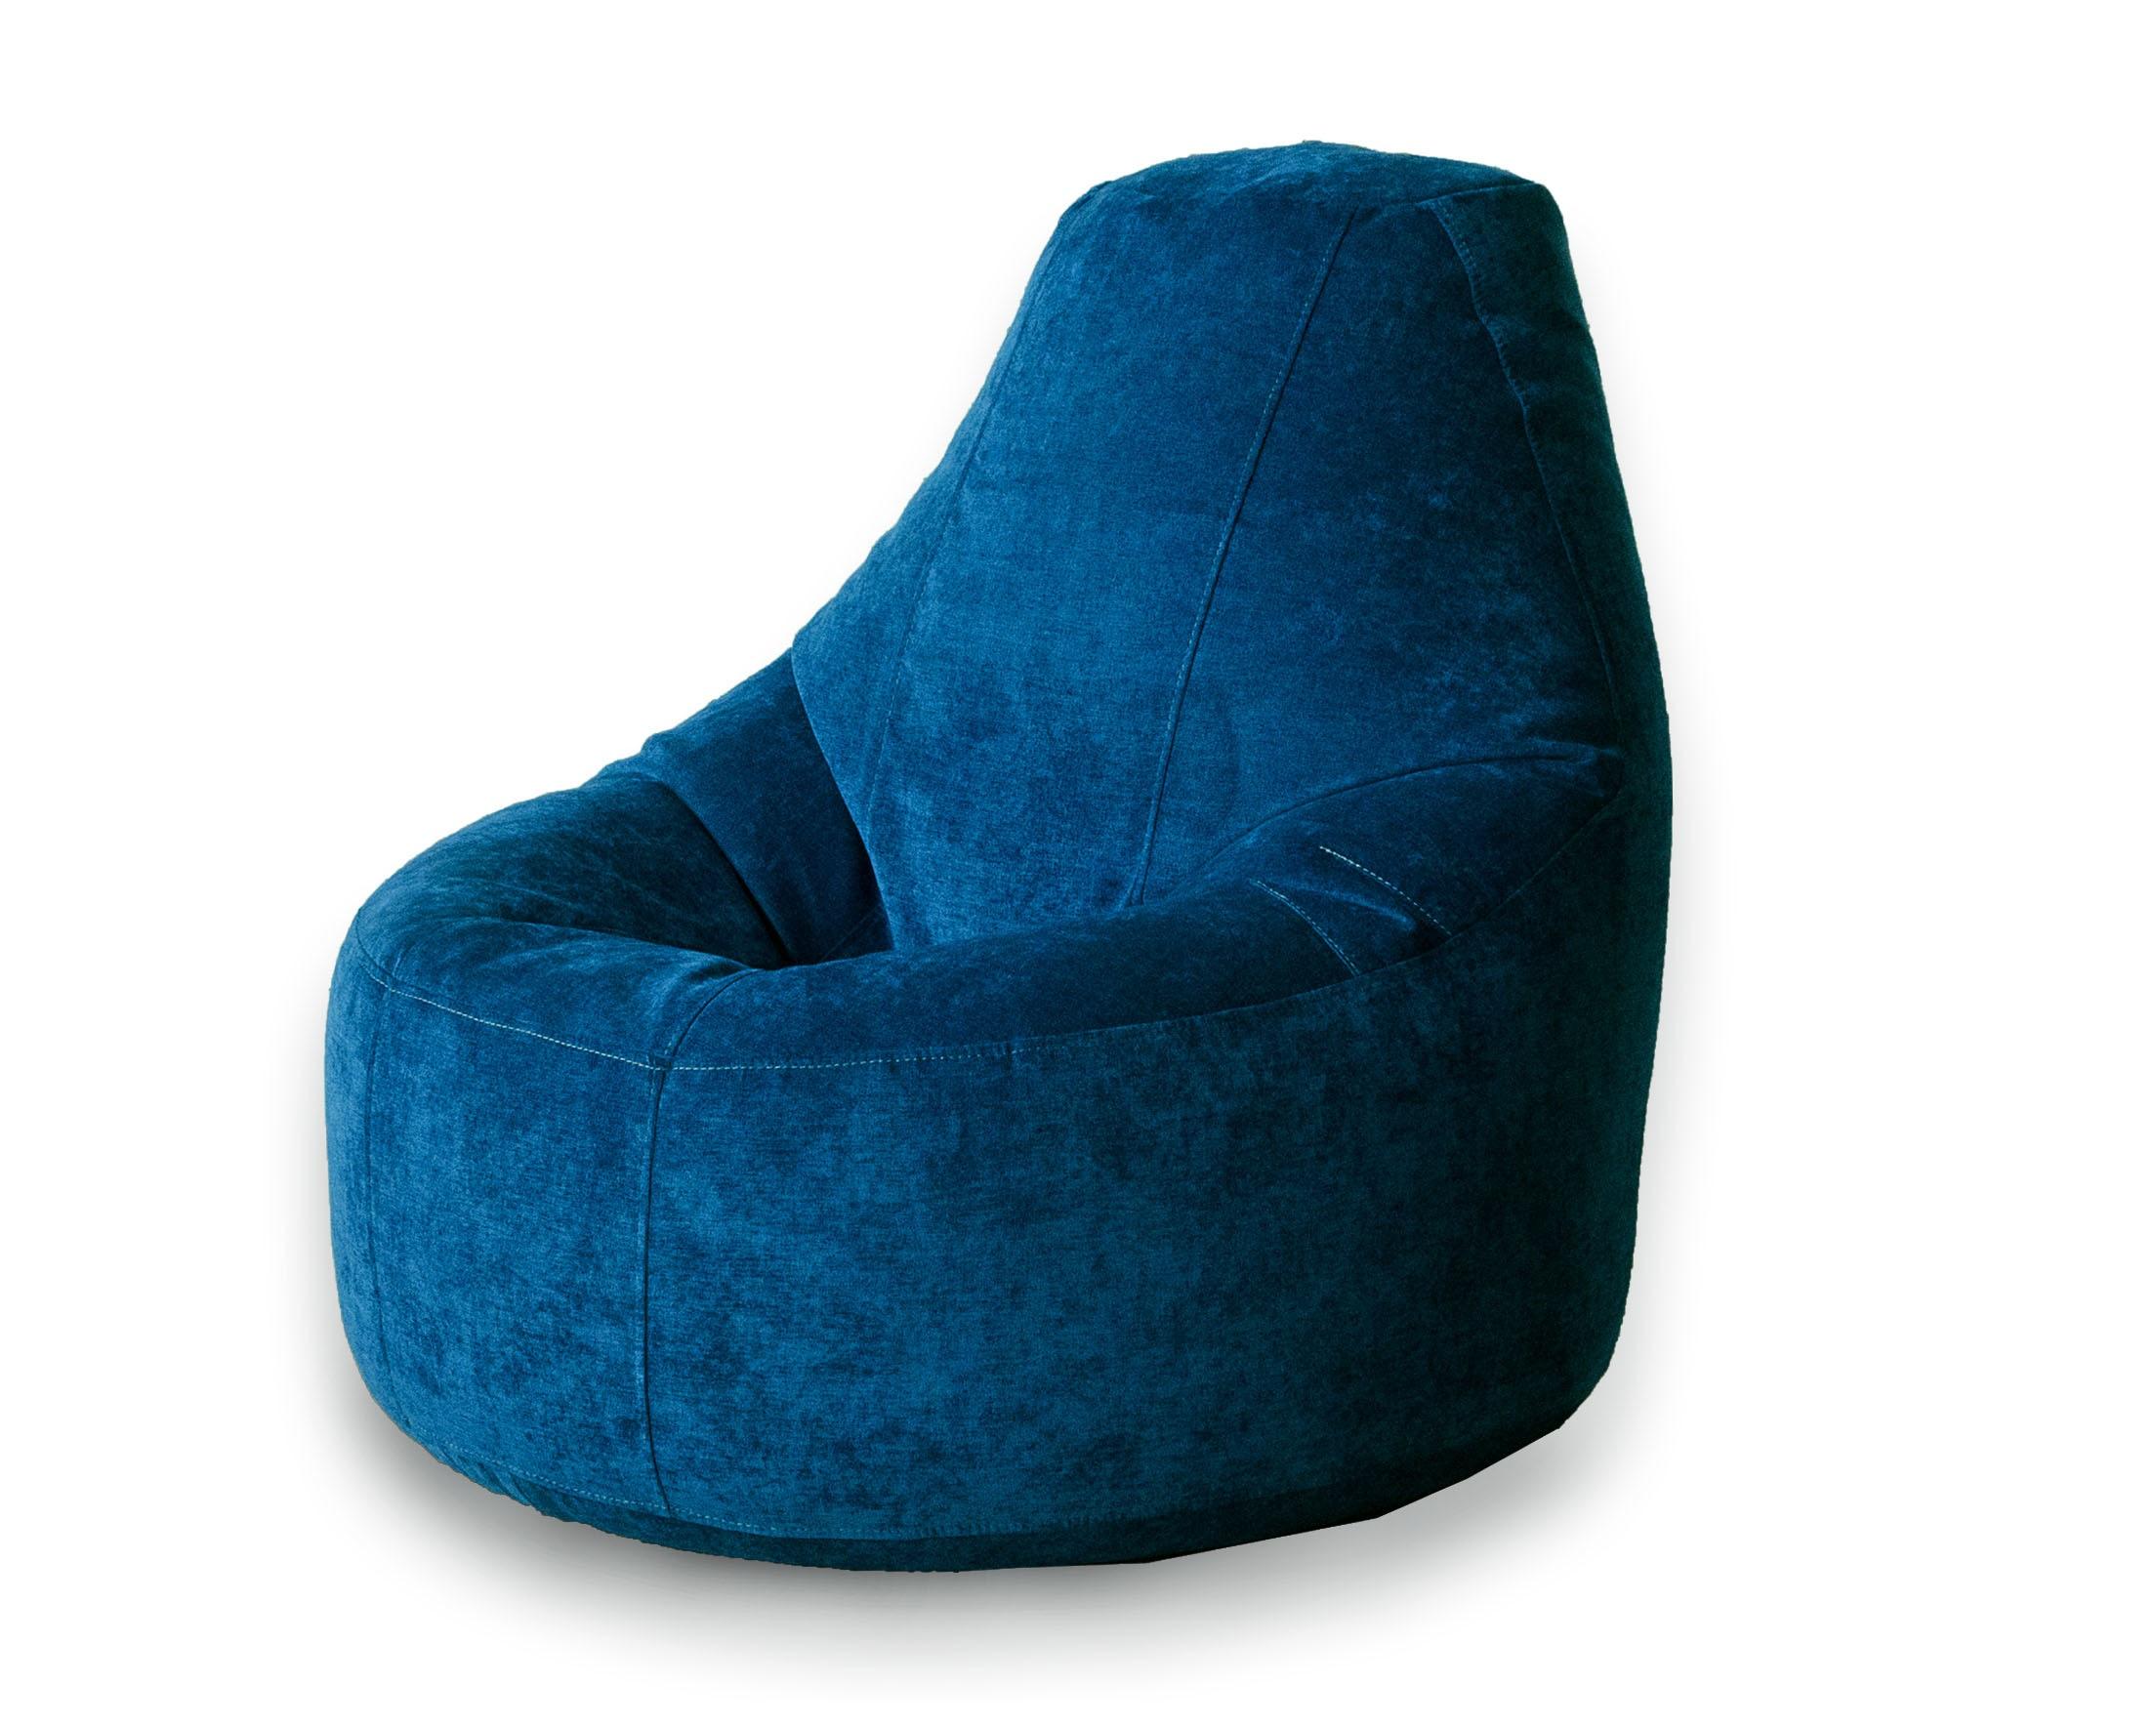 Кресло-мешок SoftComfort 15445838 от thefurnish